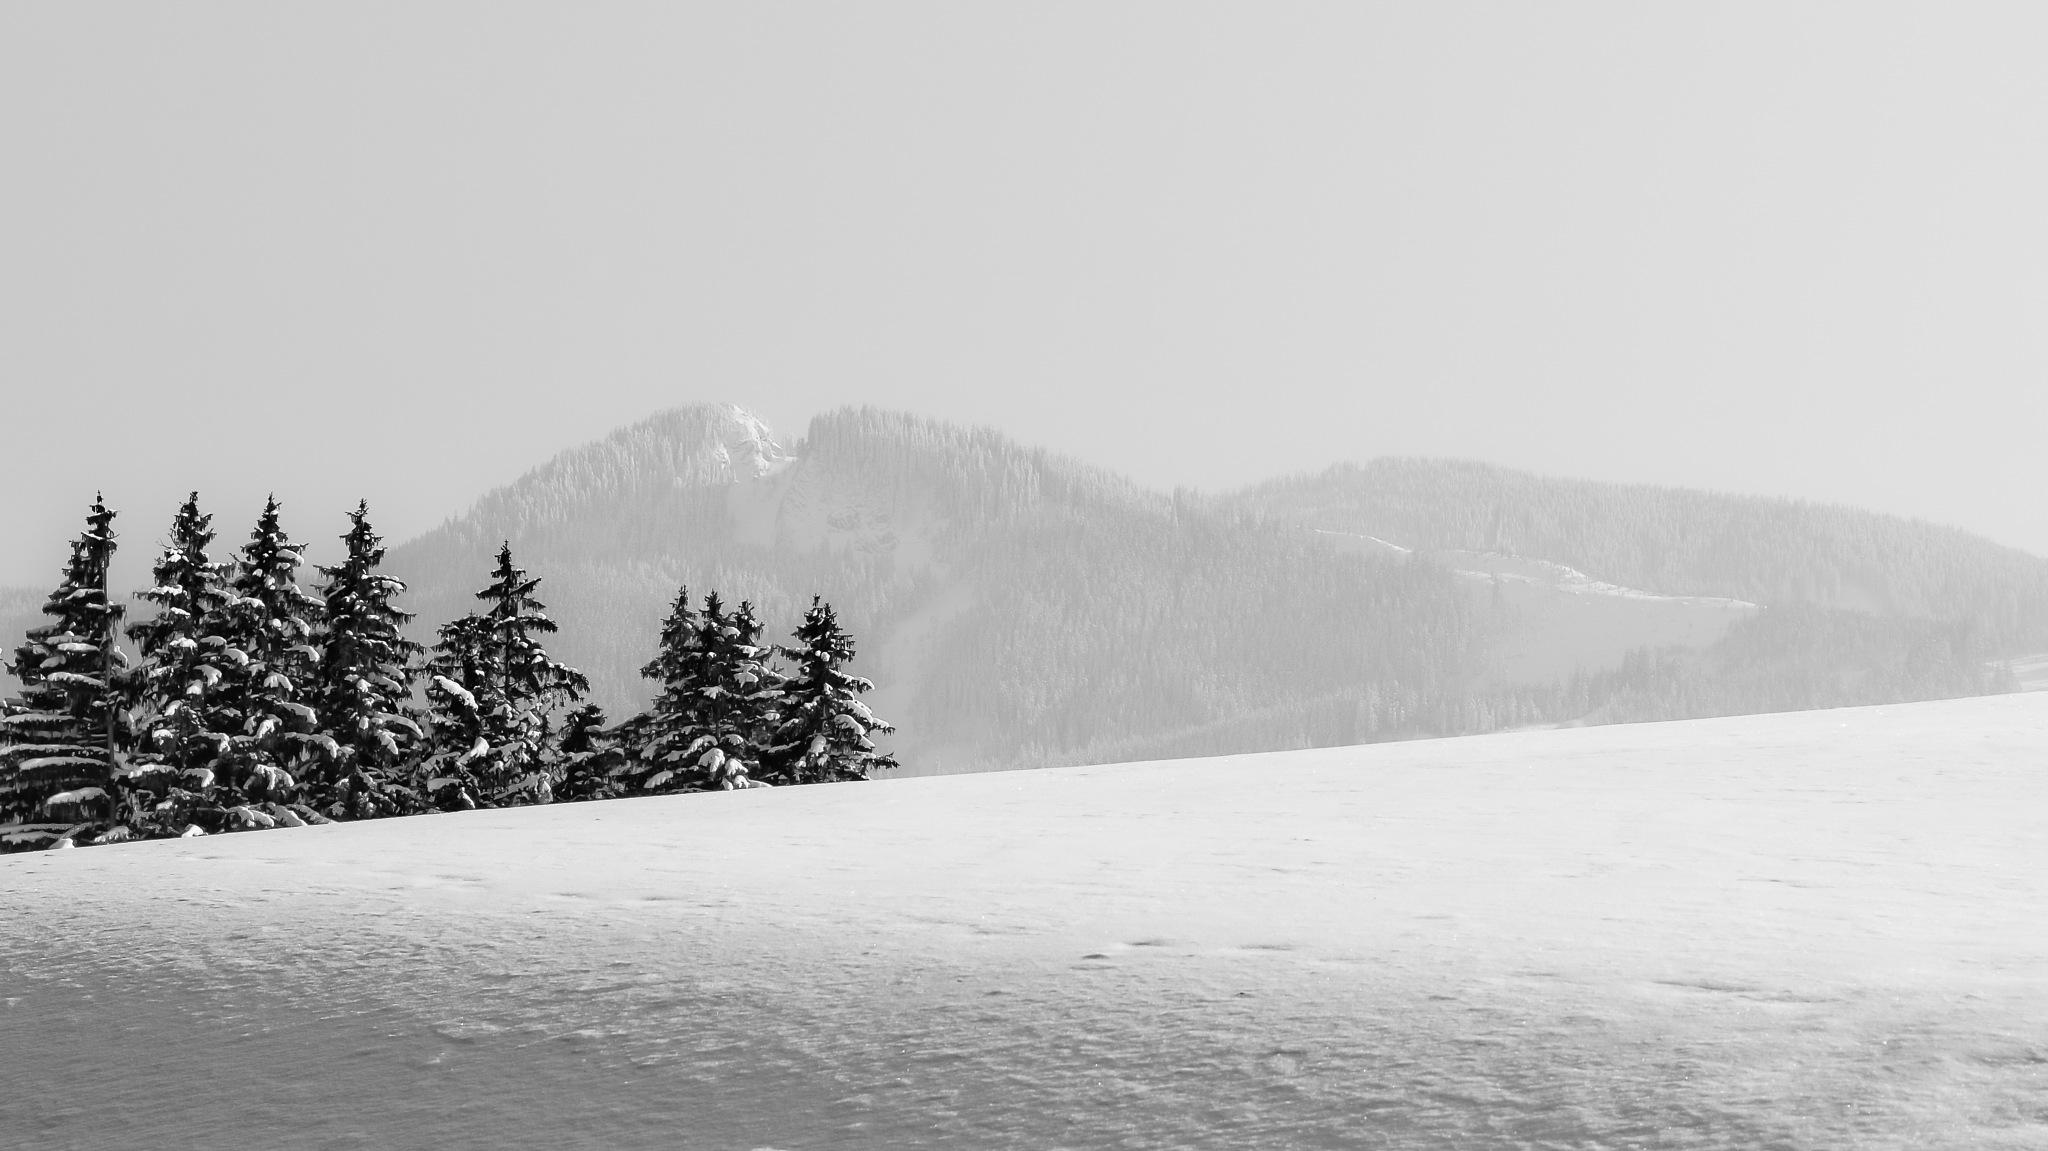 Winter in the Alpen by Safta Ciprian